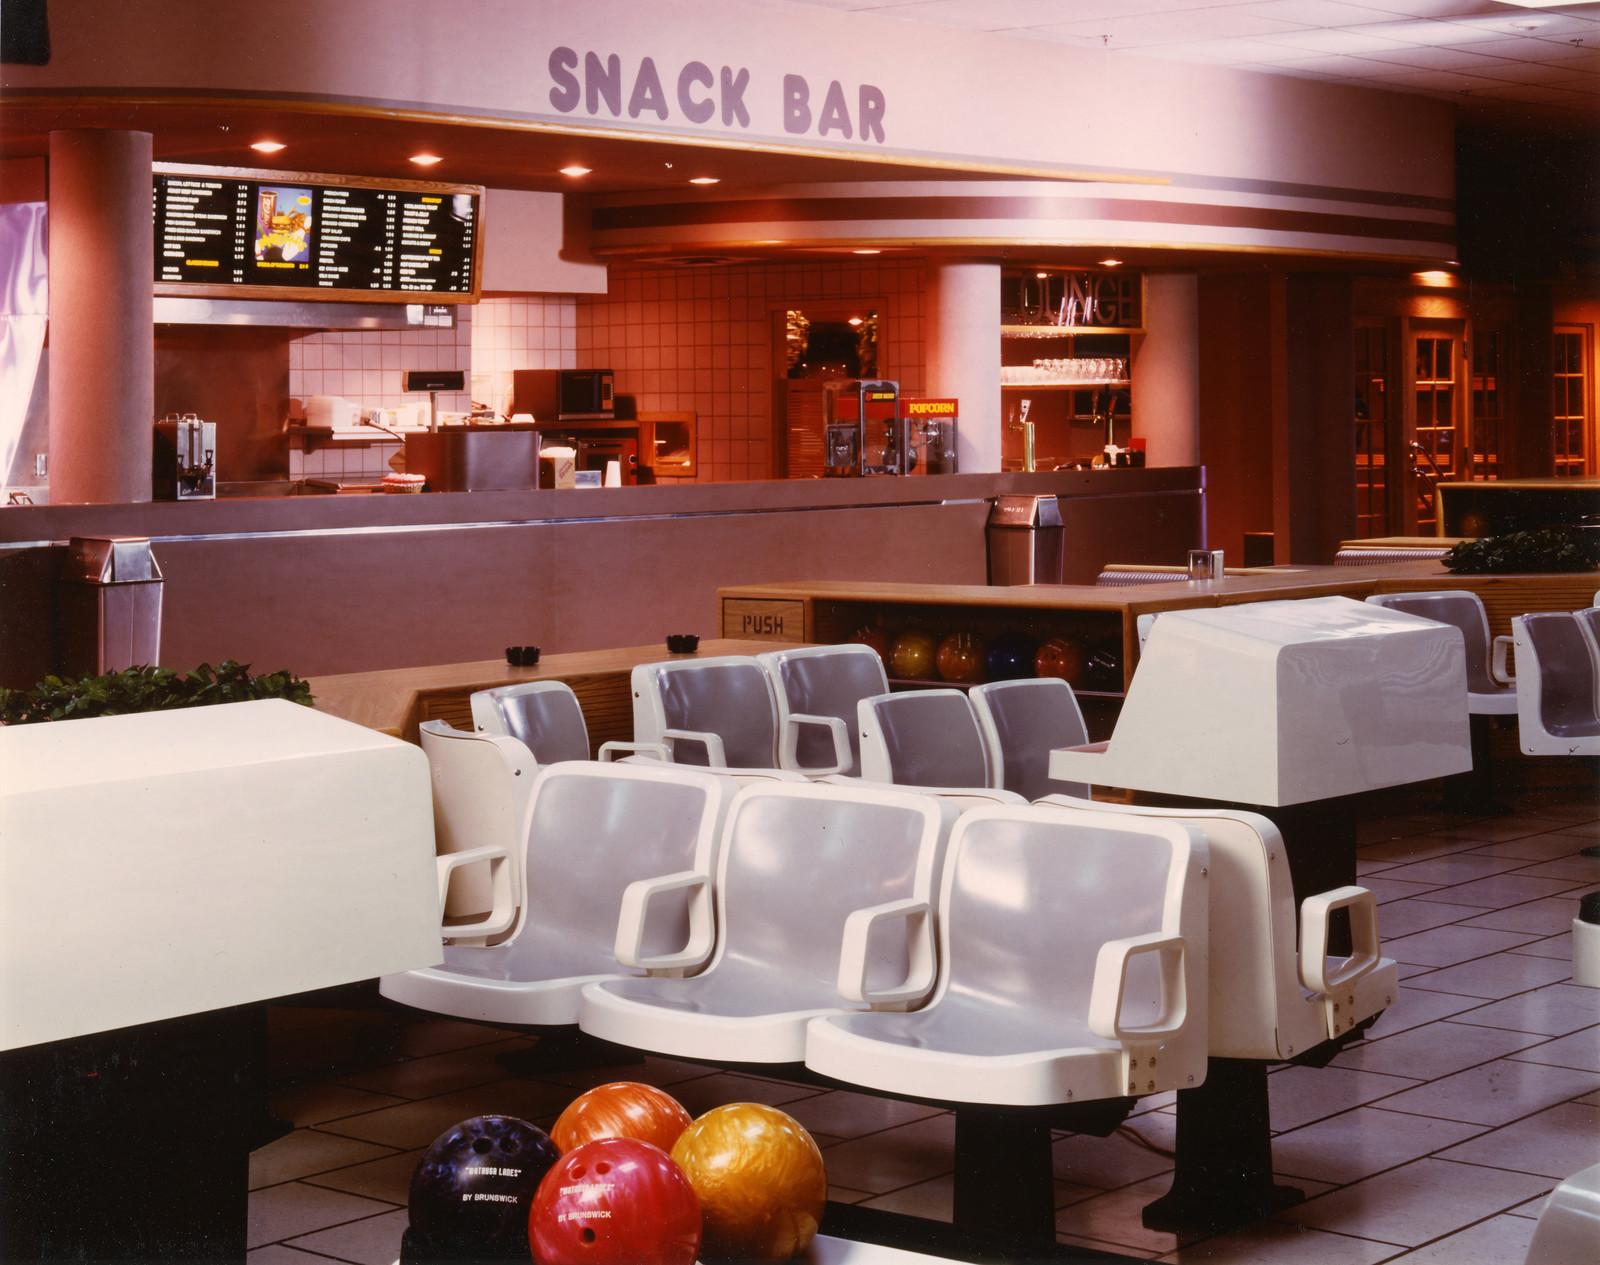 Brunswick Watauga Lanes - Snack Bar